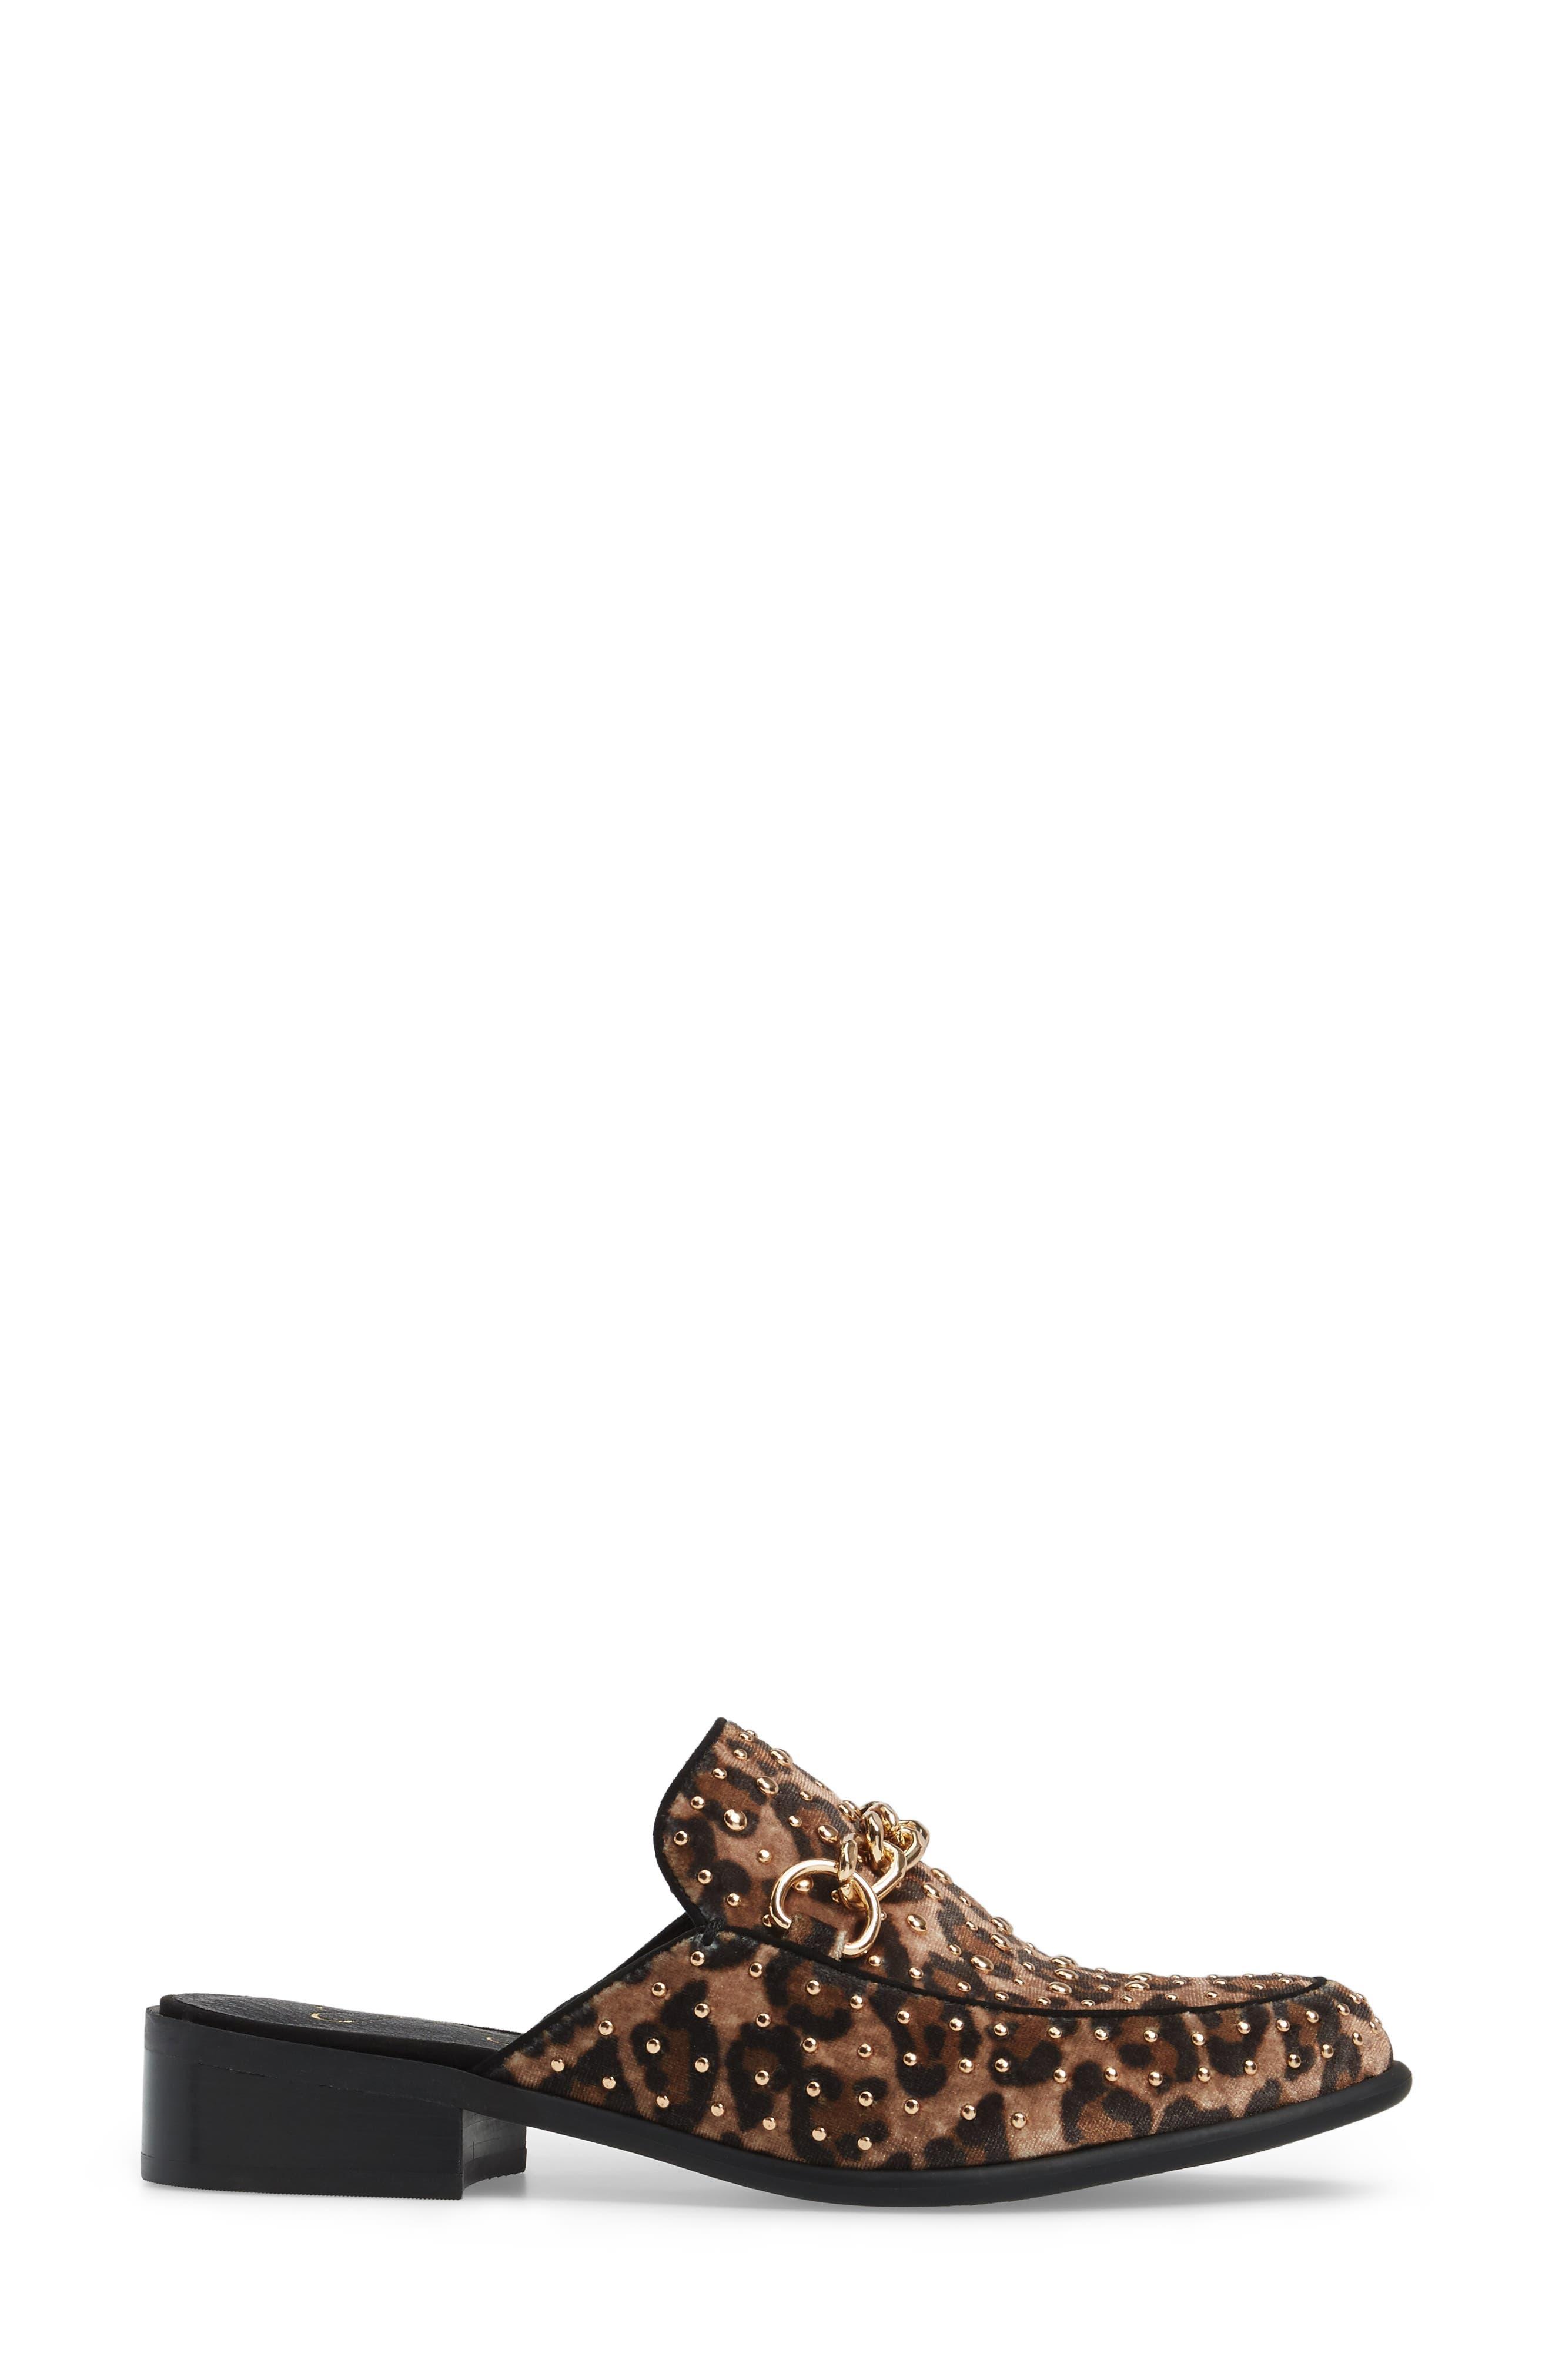 Alternate Image 3  - Jessica Simpson Beez Loafer Mule (Women)